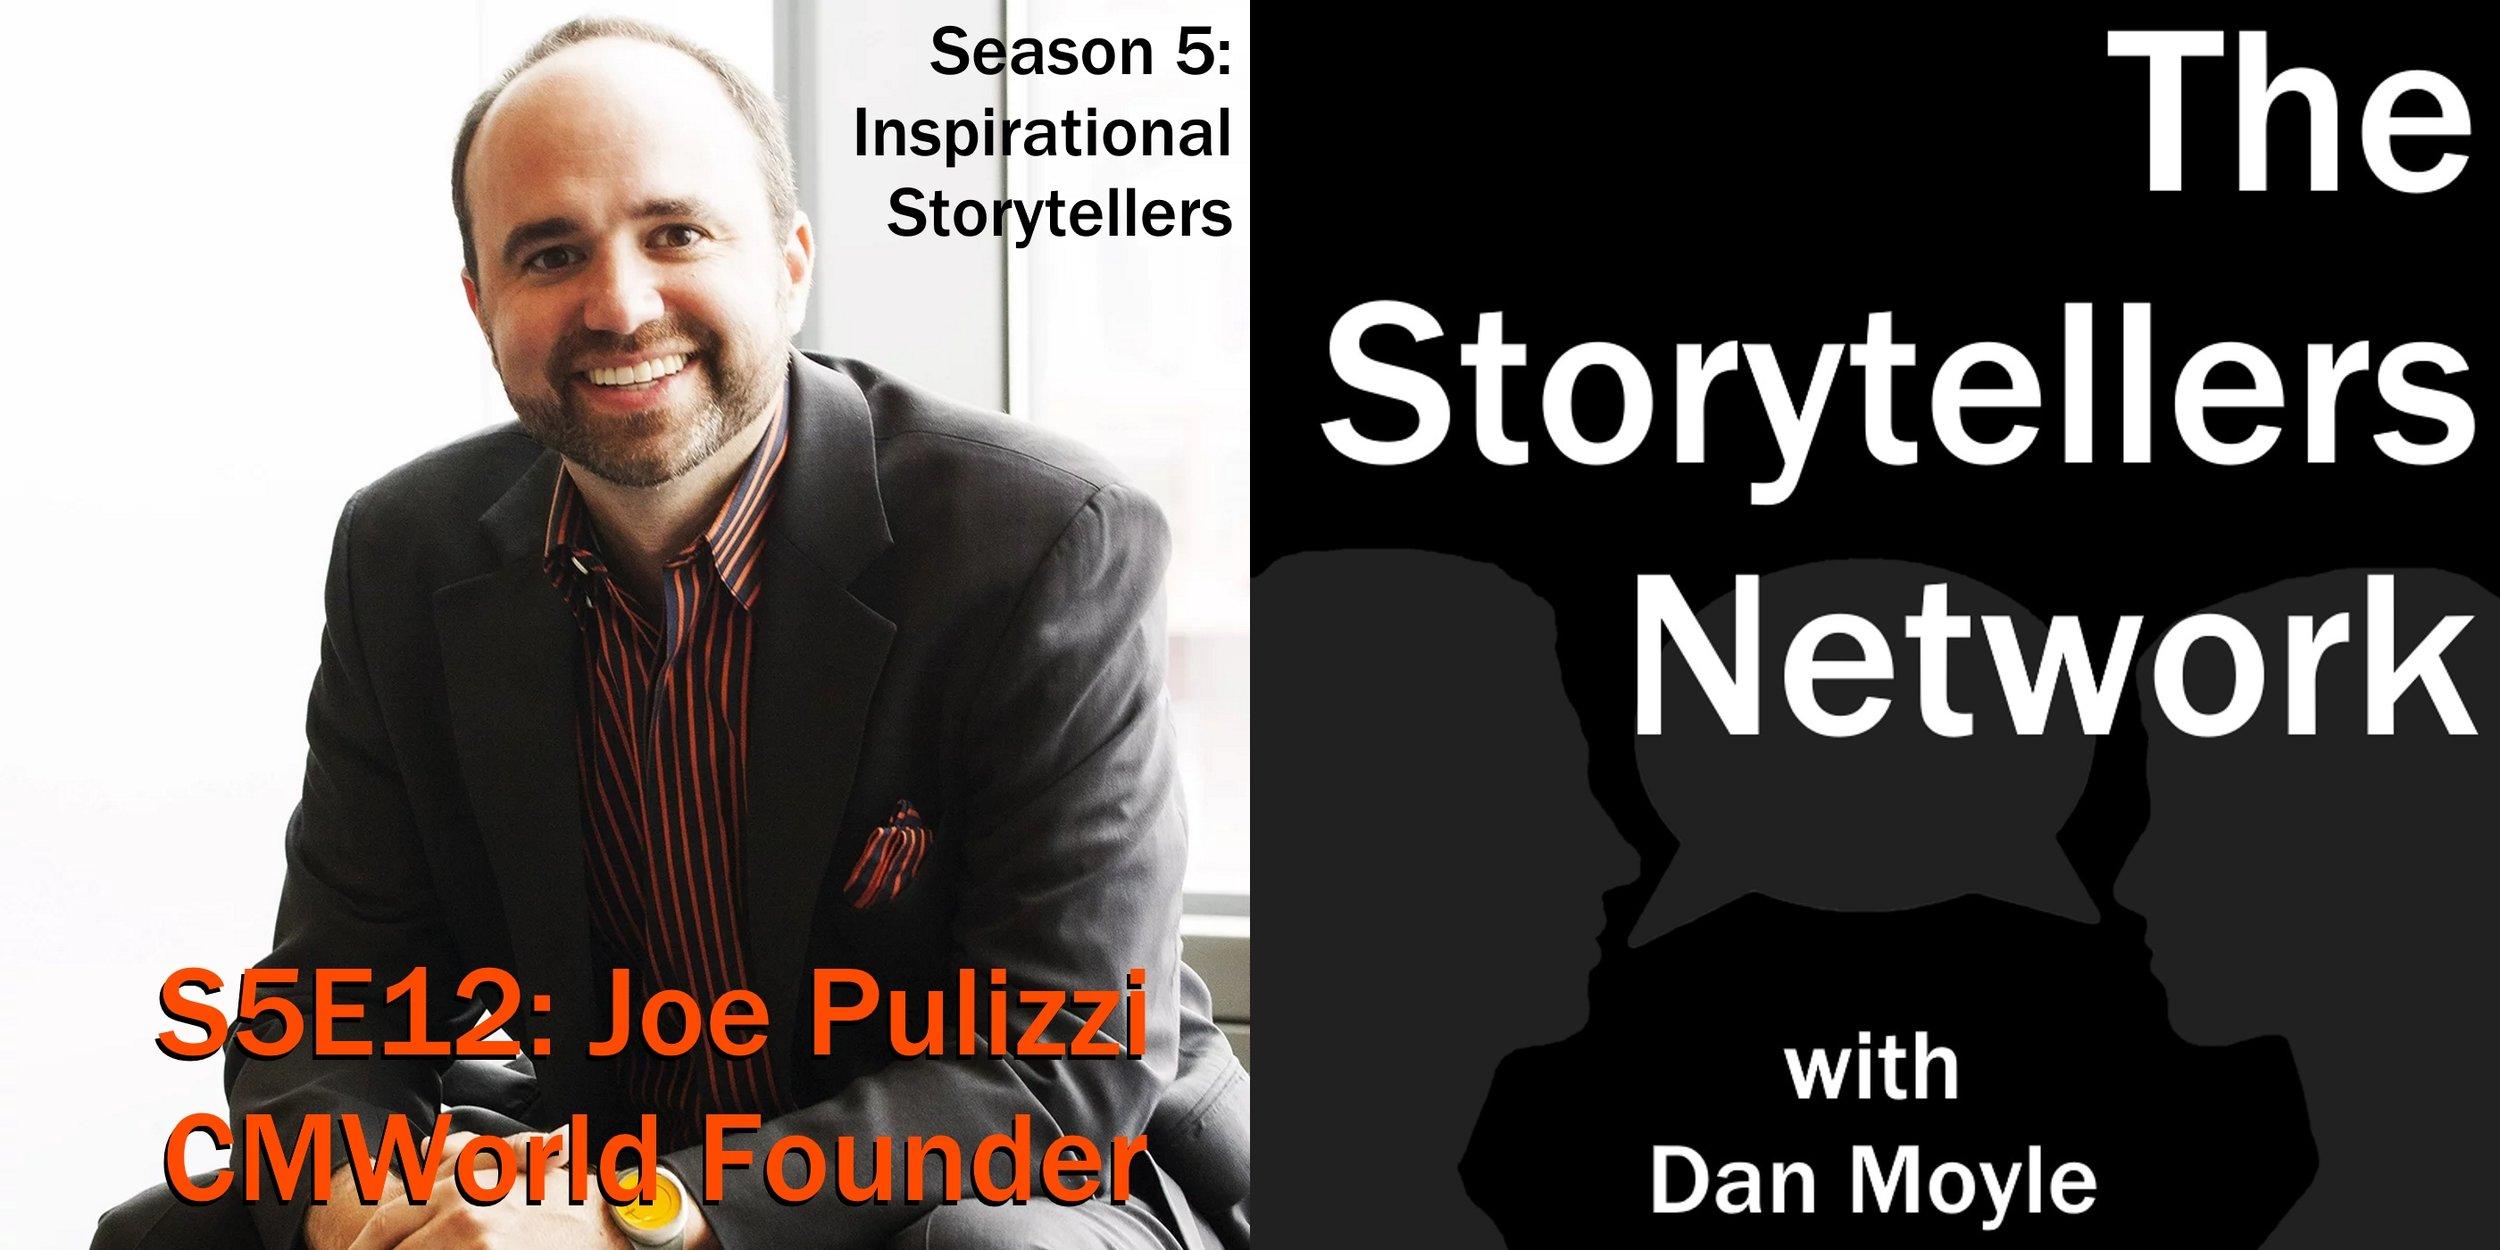 12 Joe Pulizzi Episode Artwork.jpg